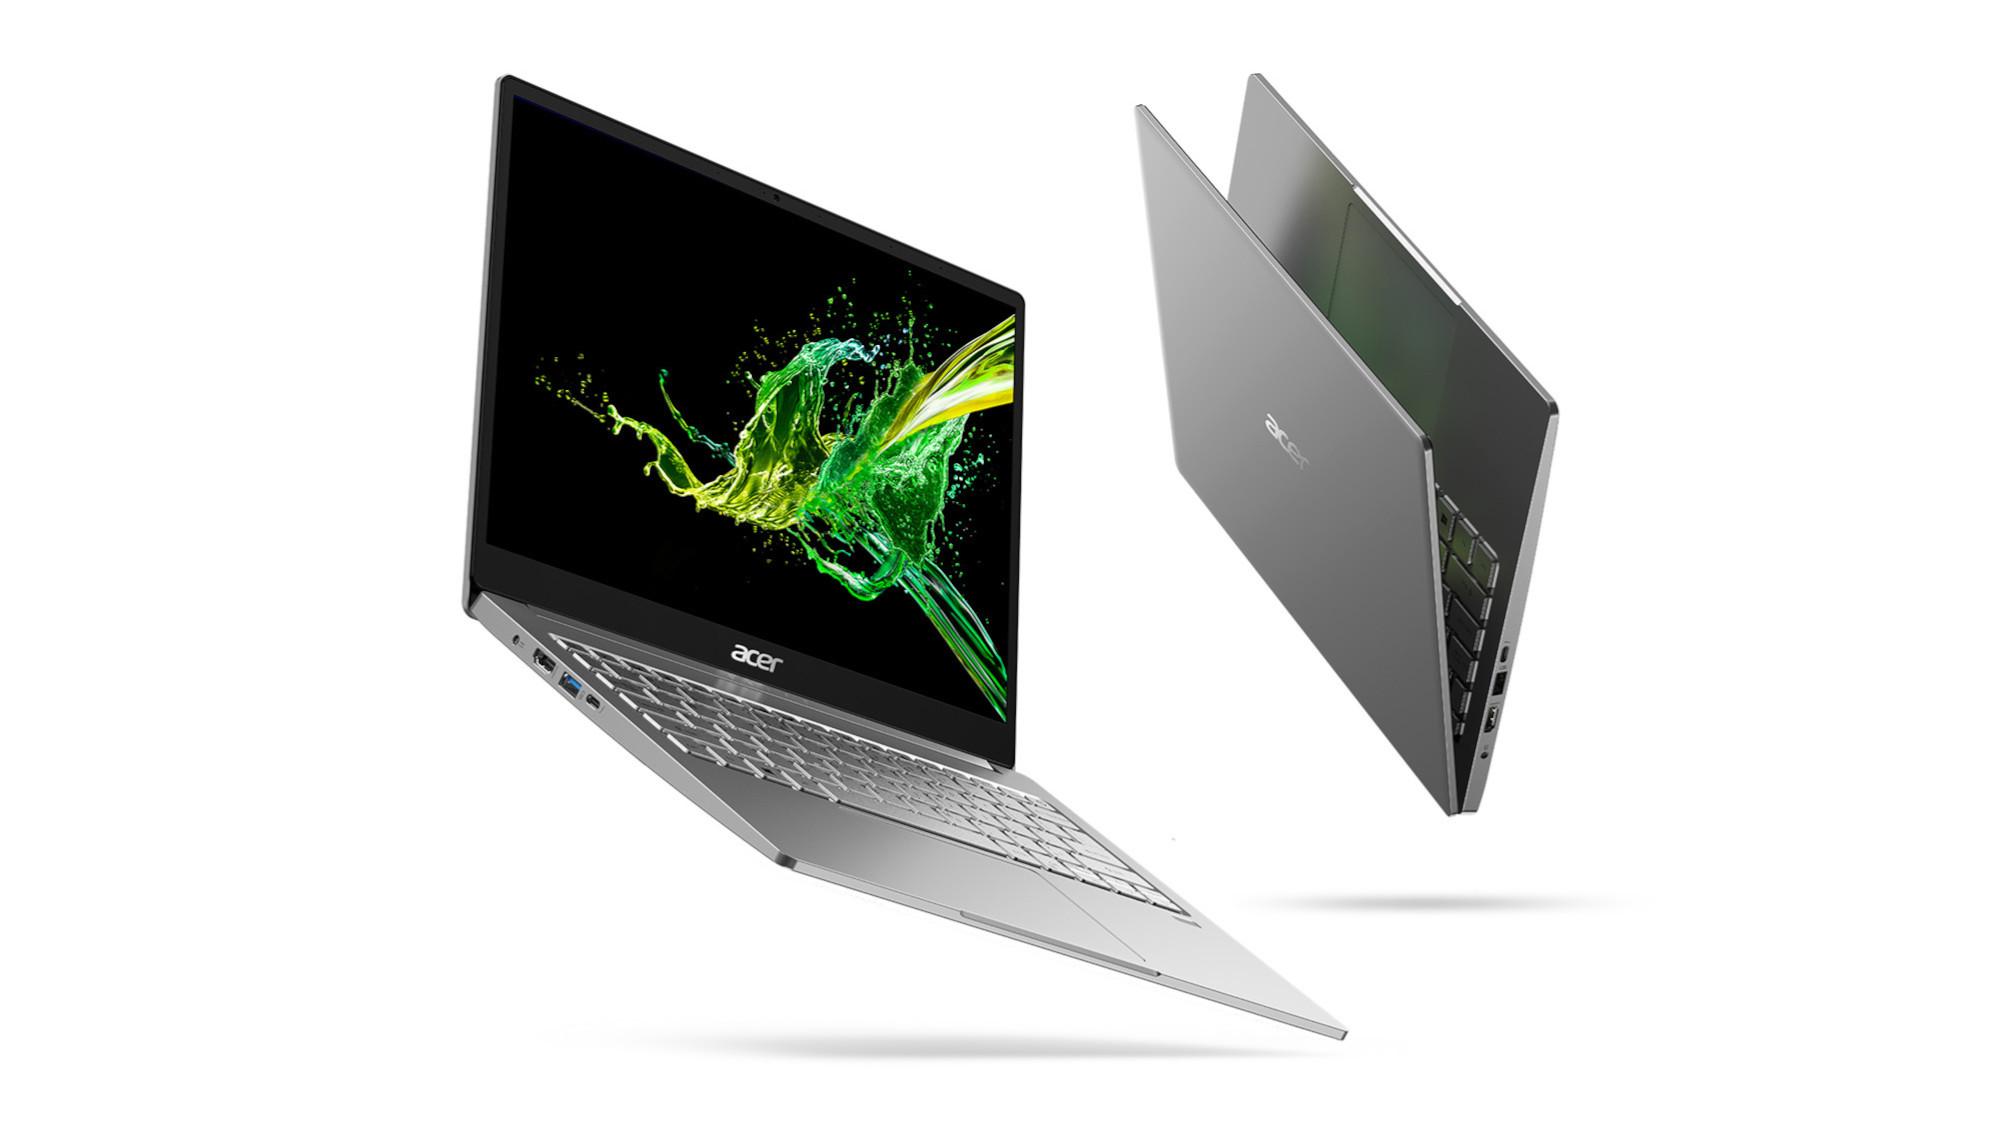 acer swift 3 prices sales deals cheap laptop